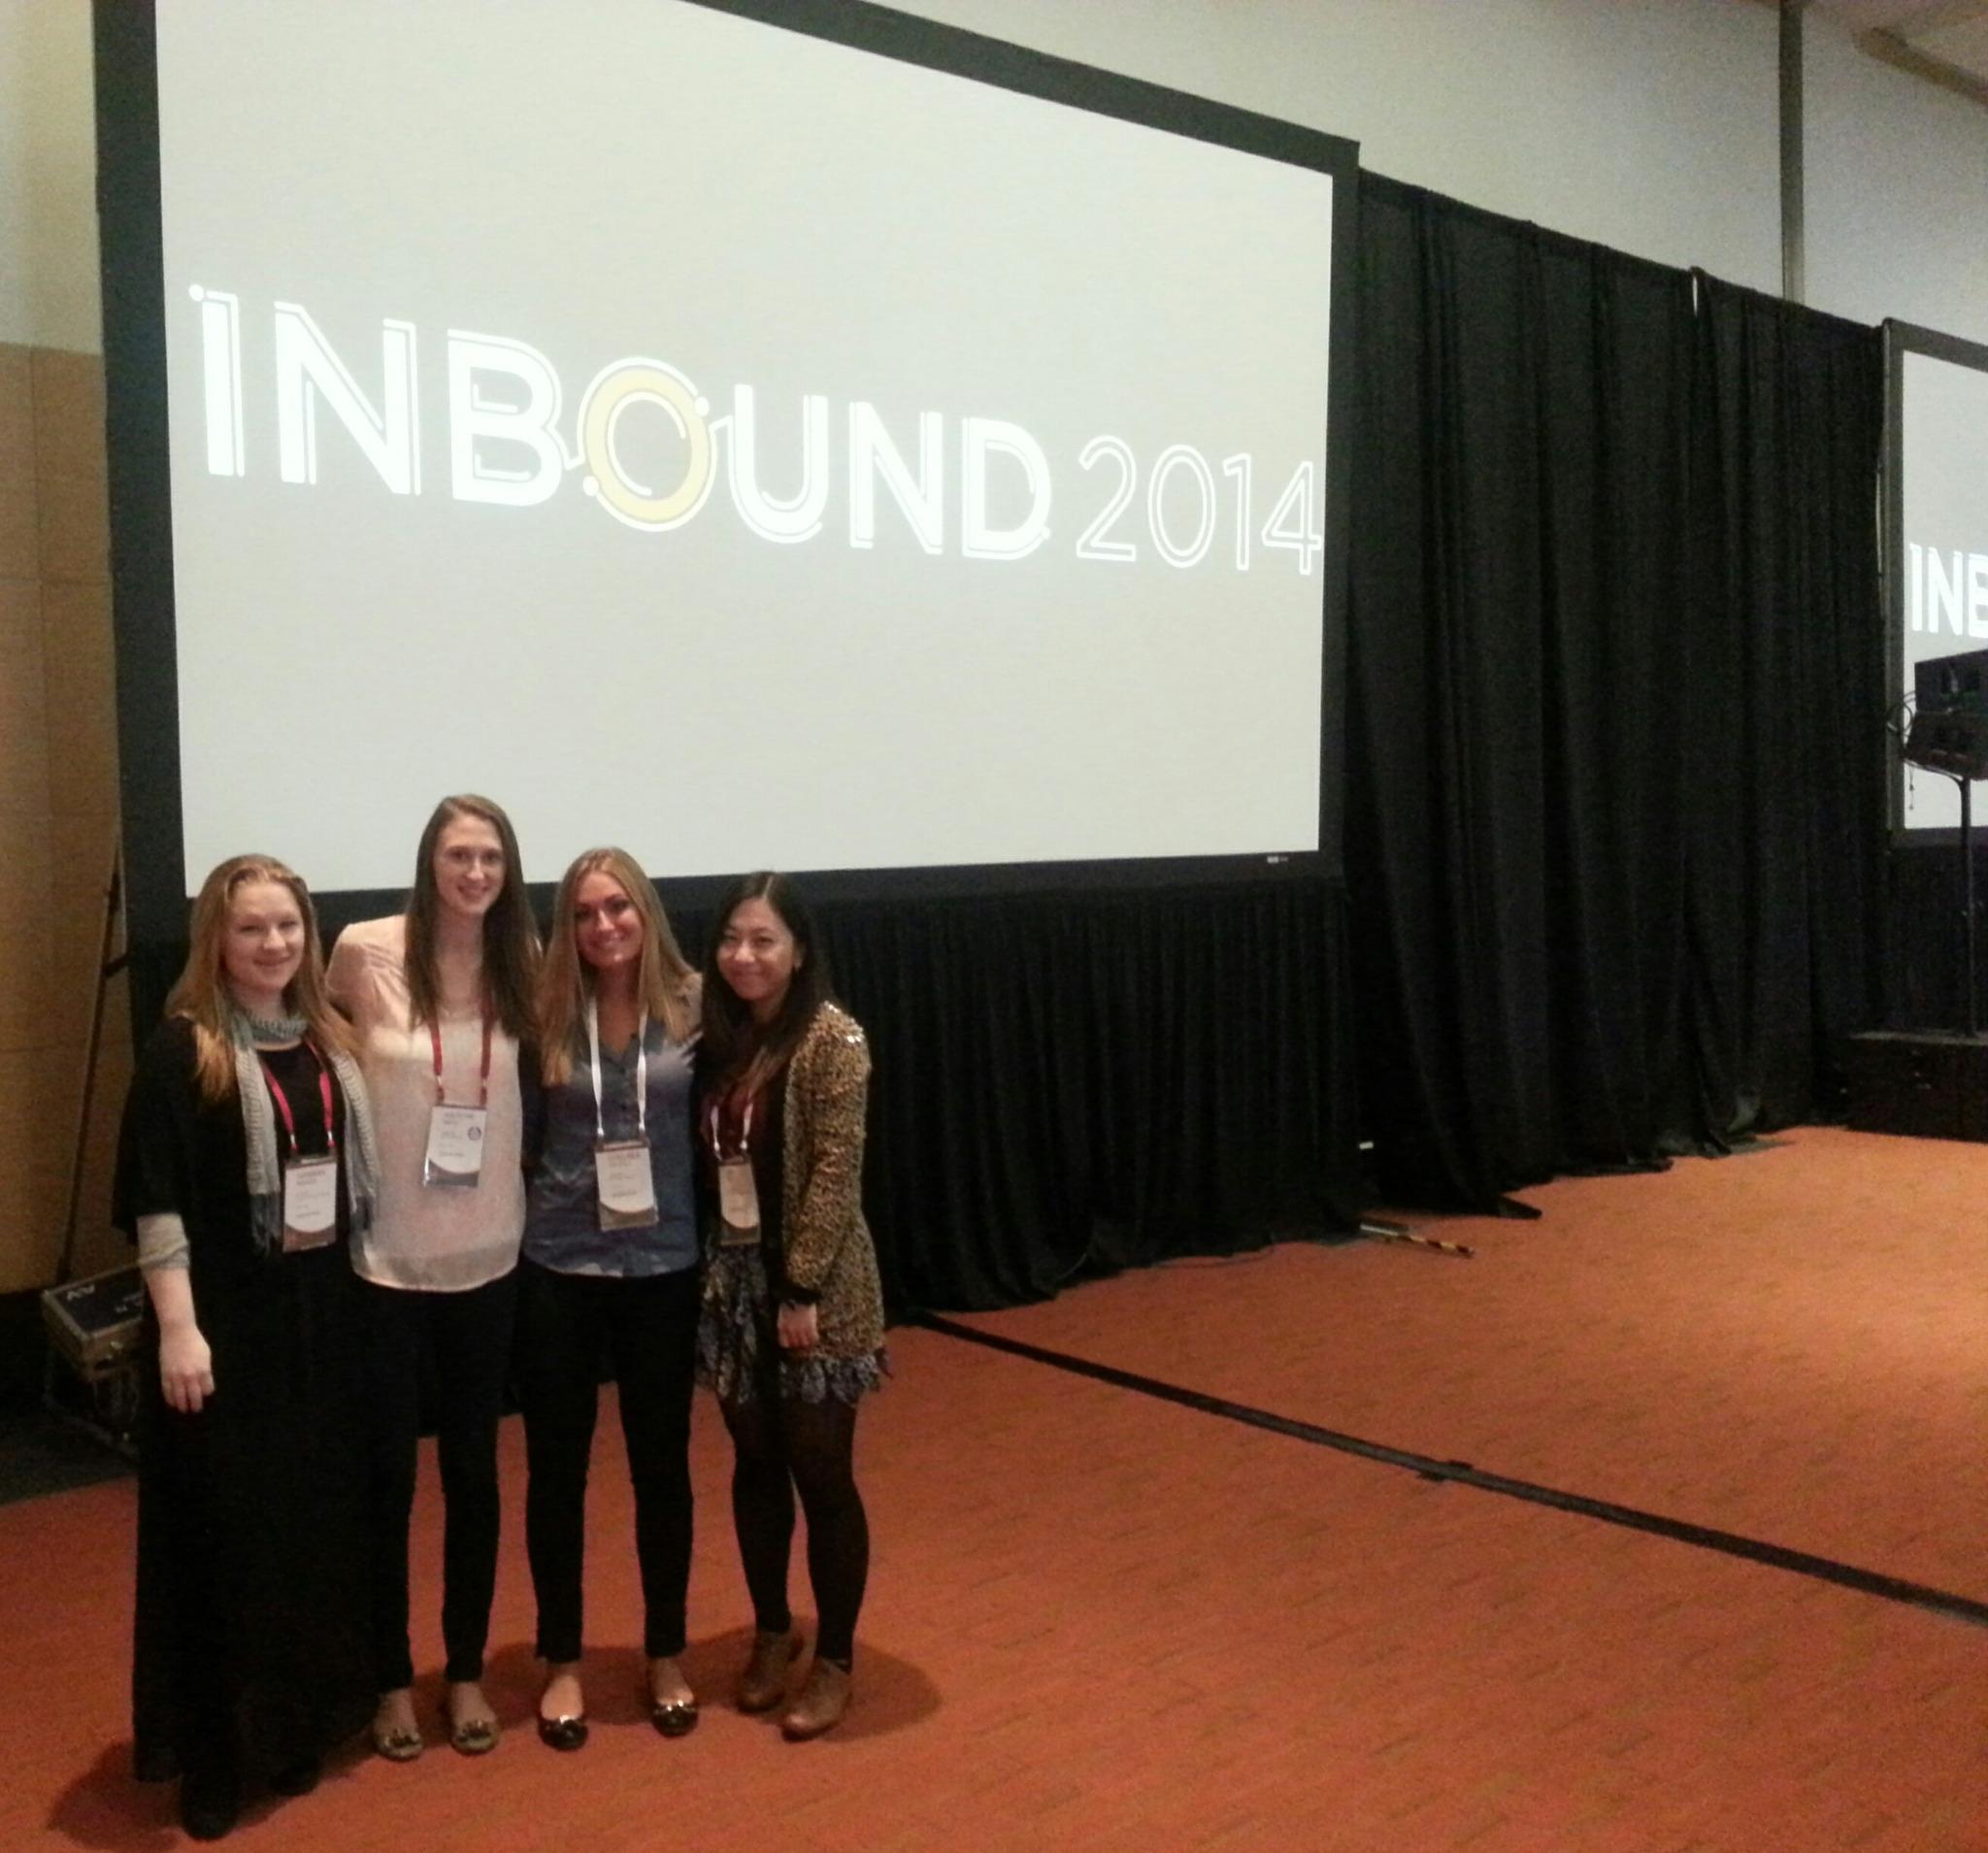 A Few Members Of The ViralGains Team Having An AMAZING Time At #INBOUND14 #FutureM http://t.co/V5v2sgr63d